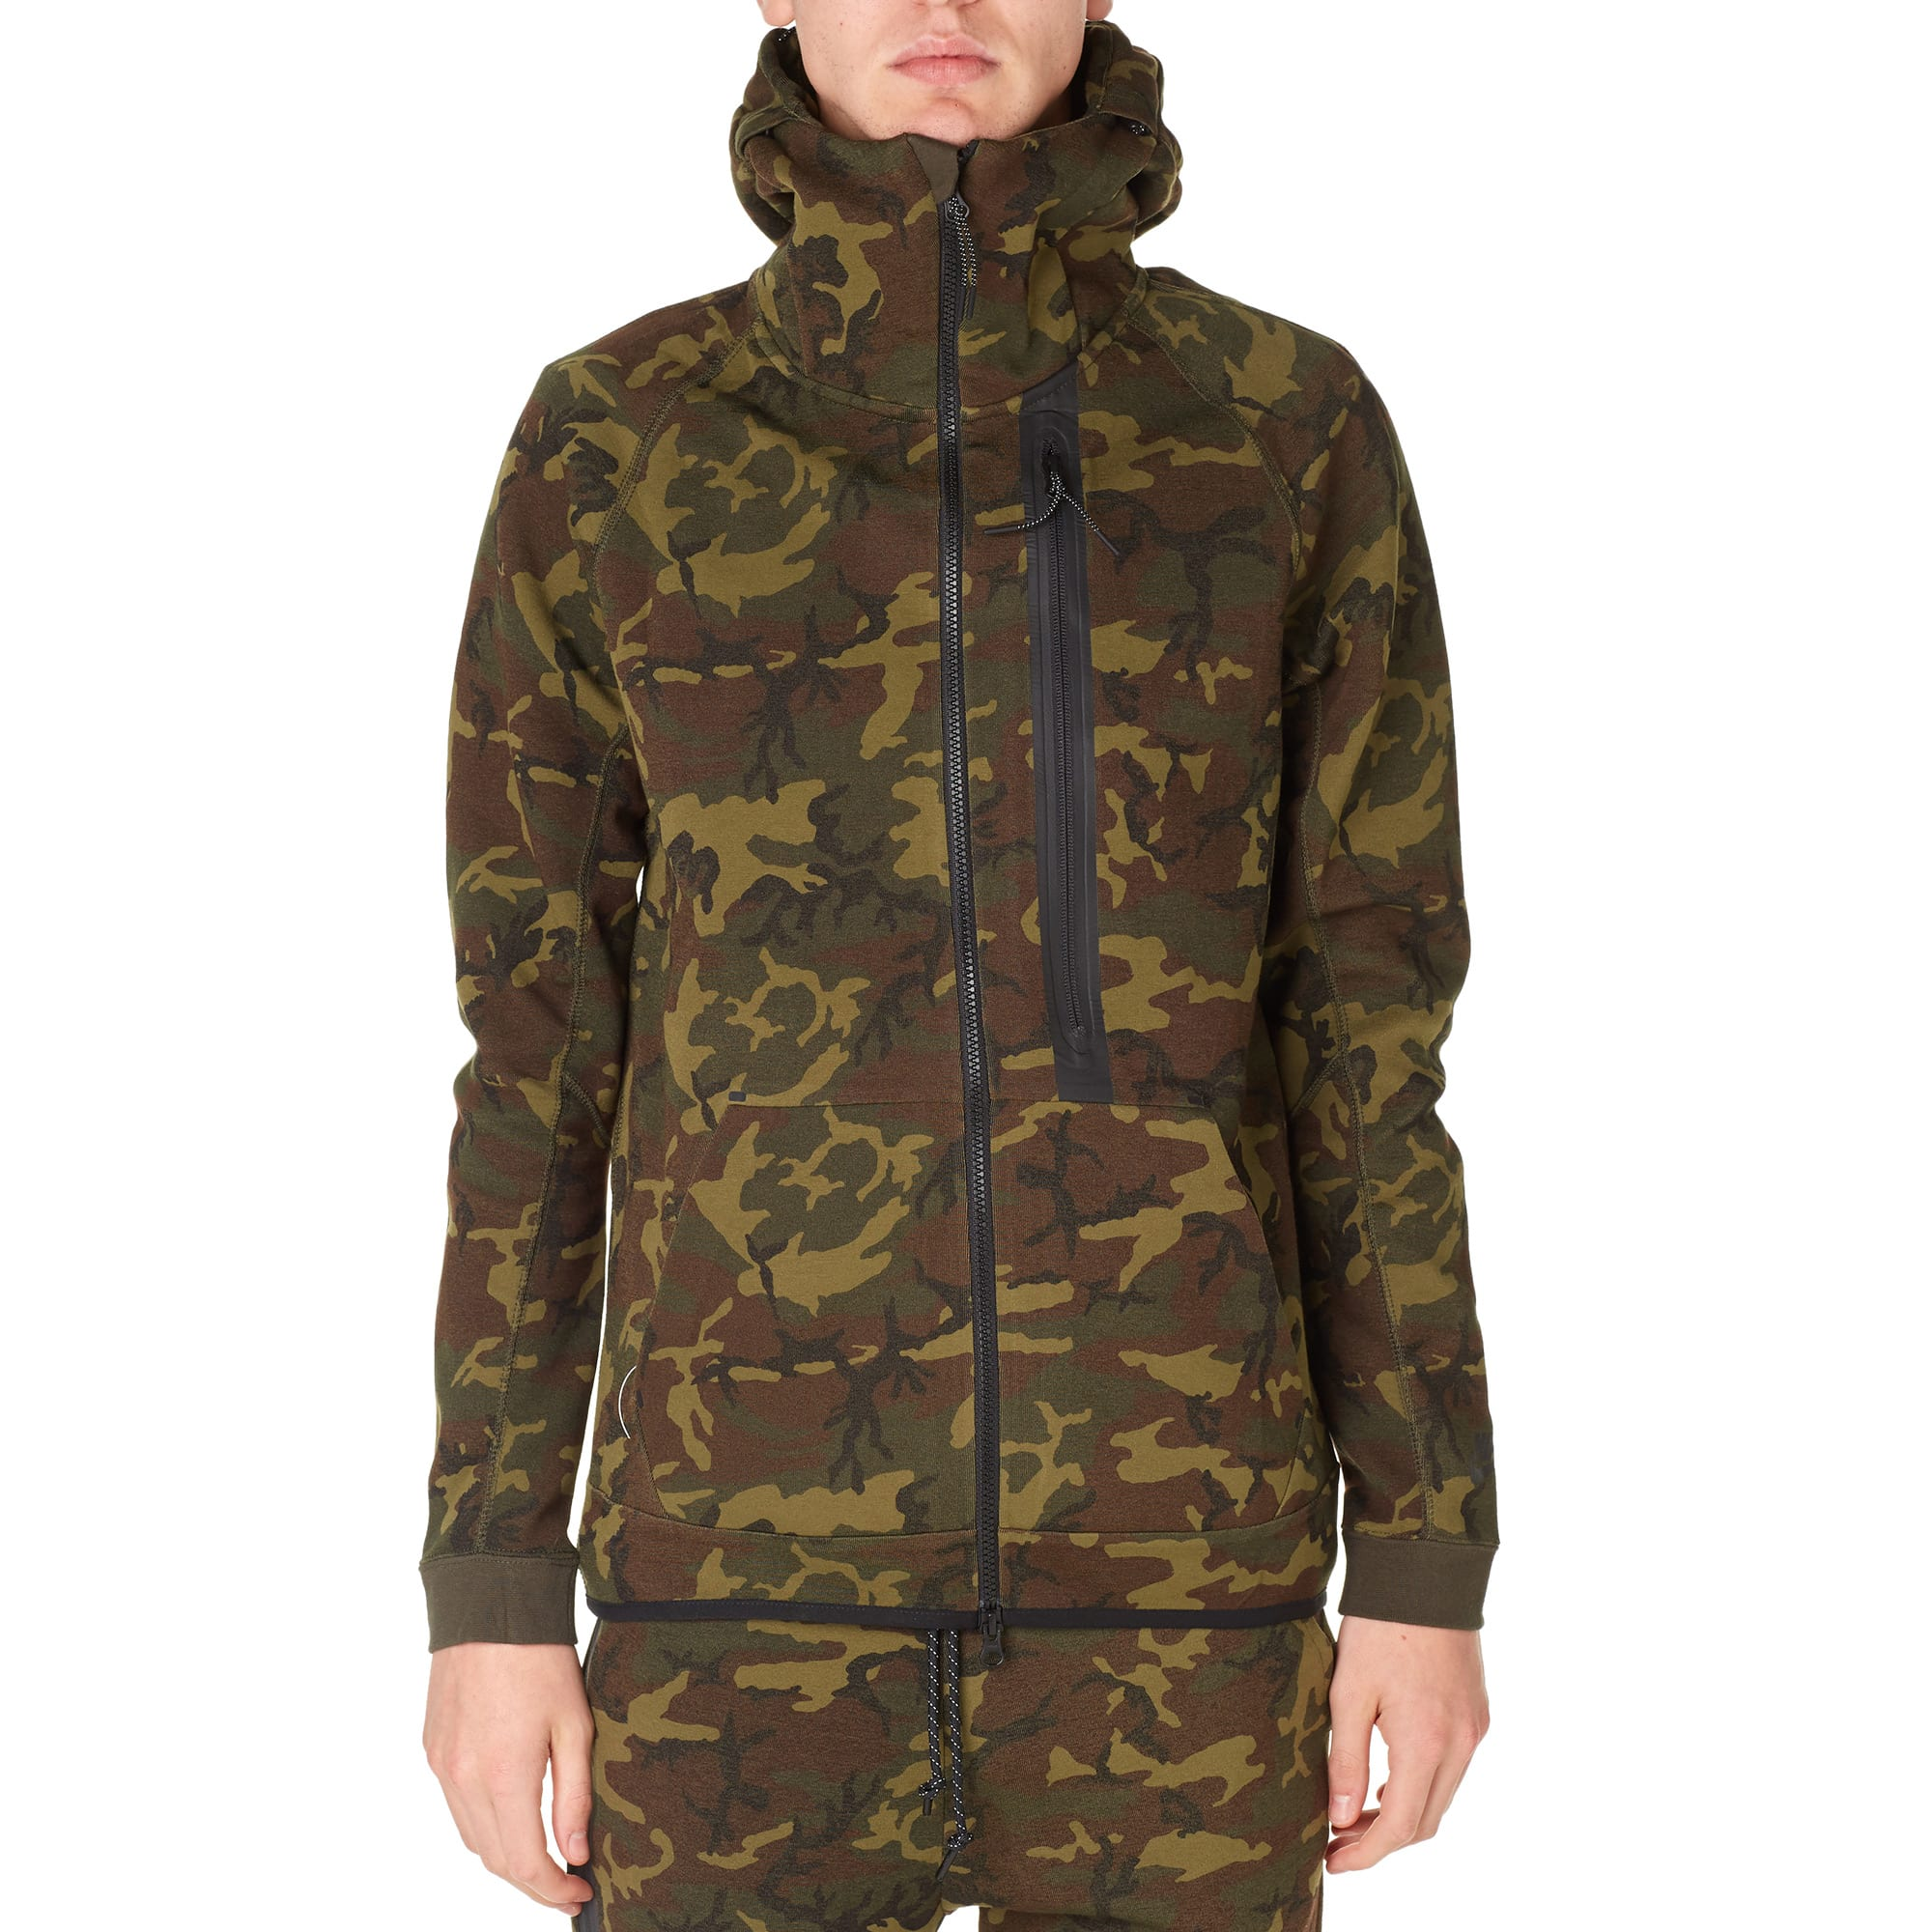 Nike jacket army - Nike Jacket Army 11